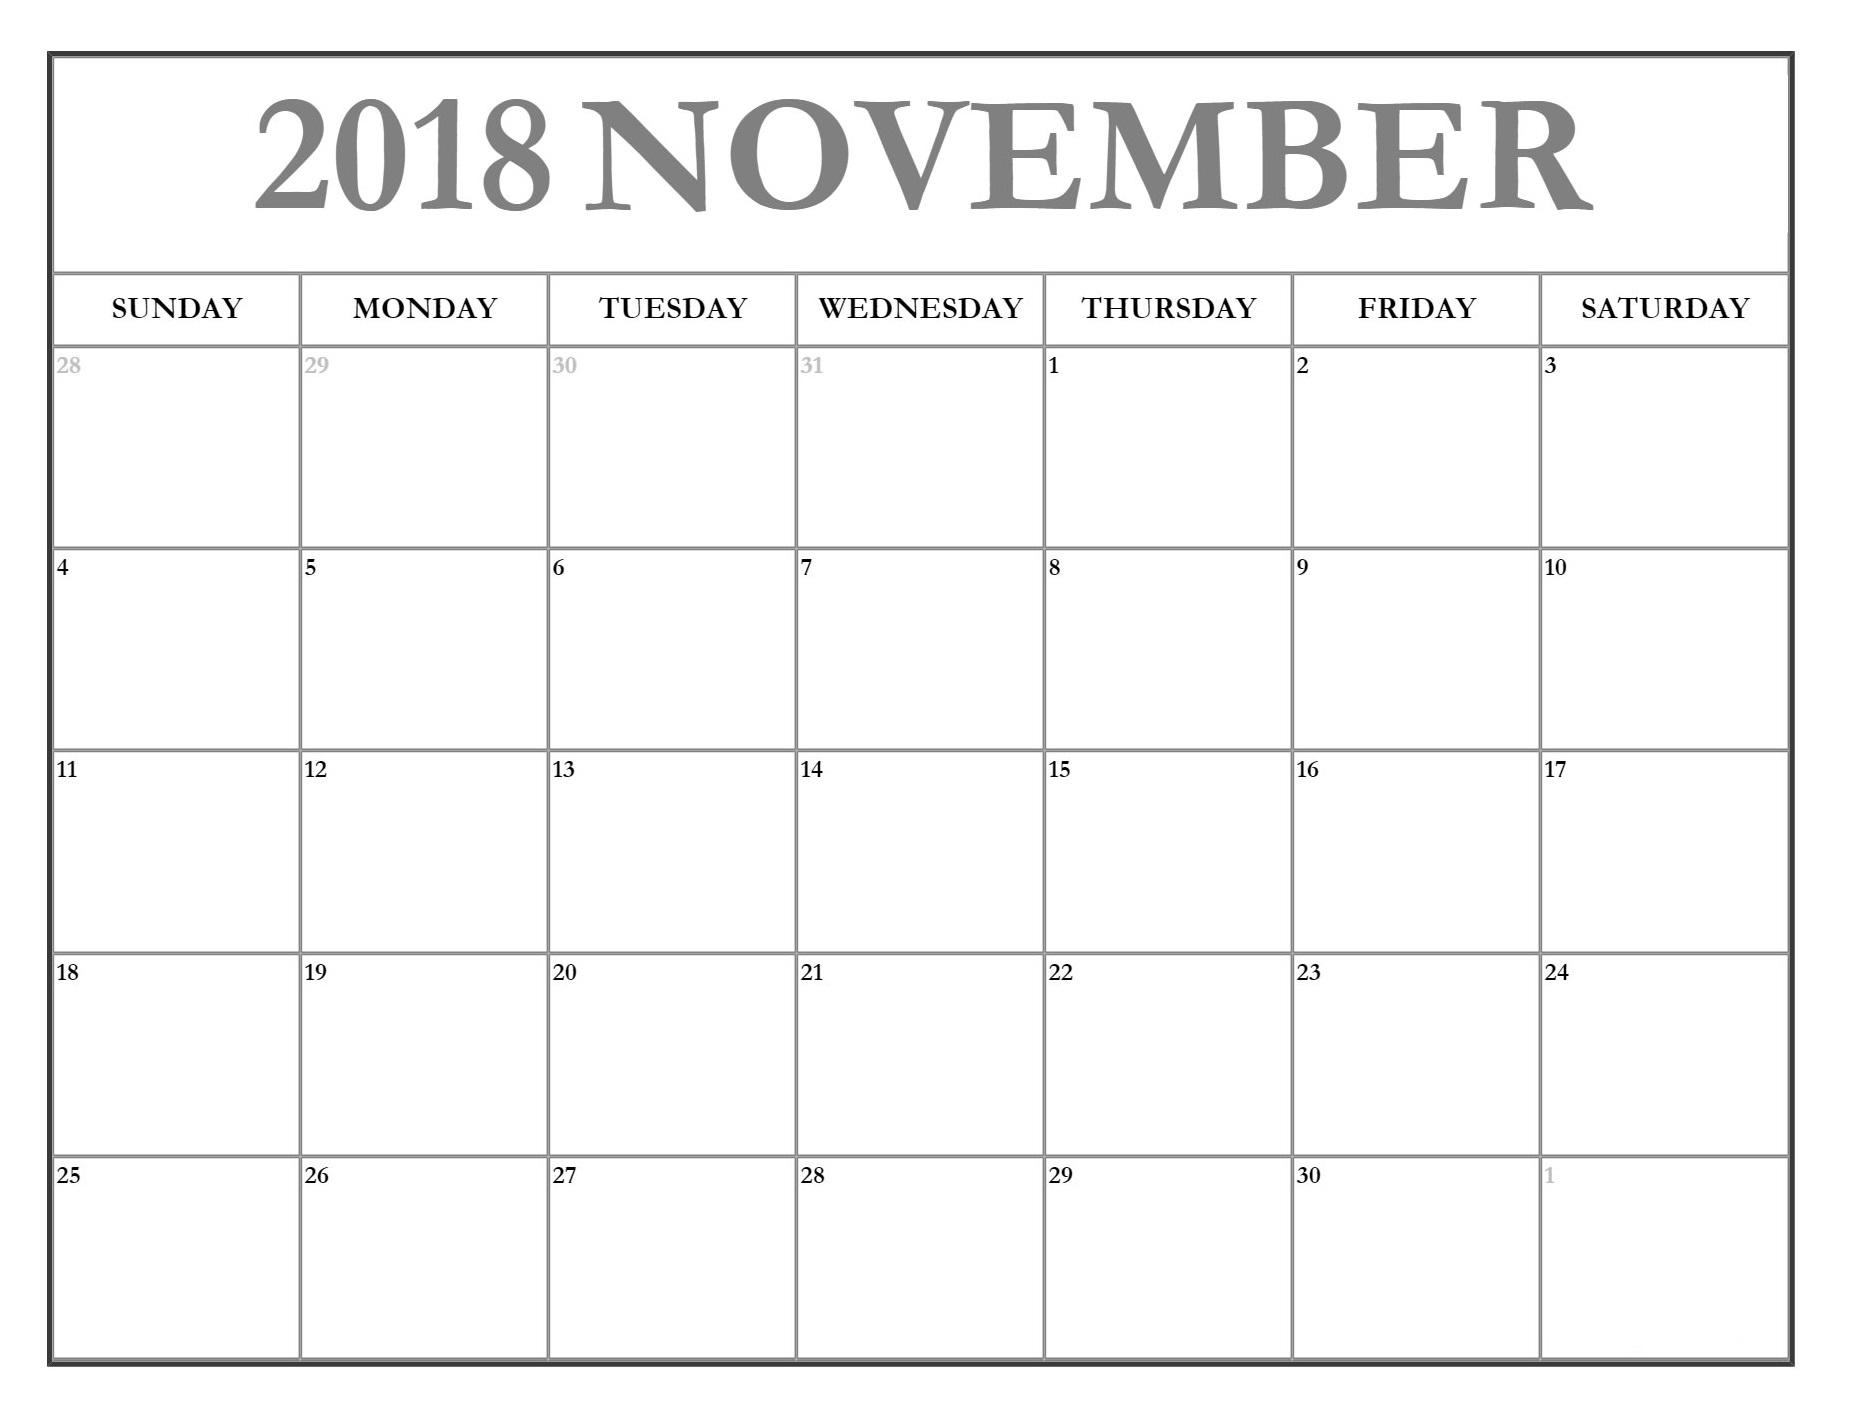 November 2018 Calendar Pdf